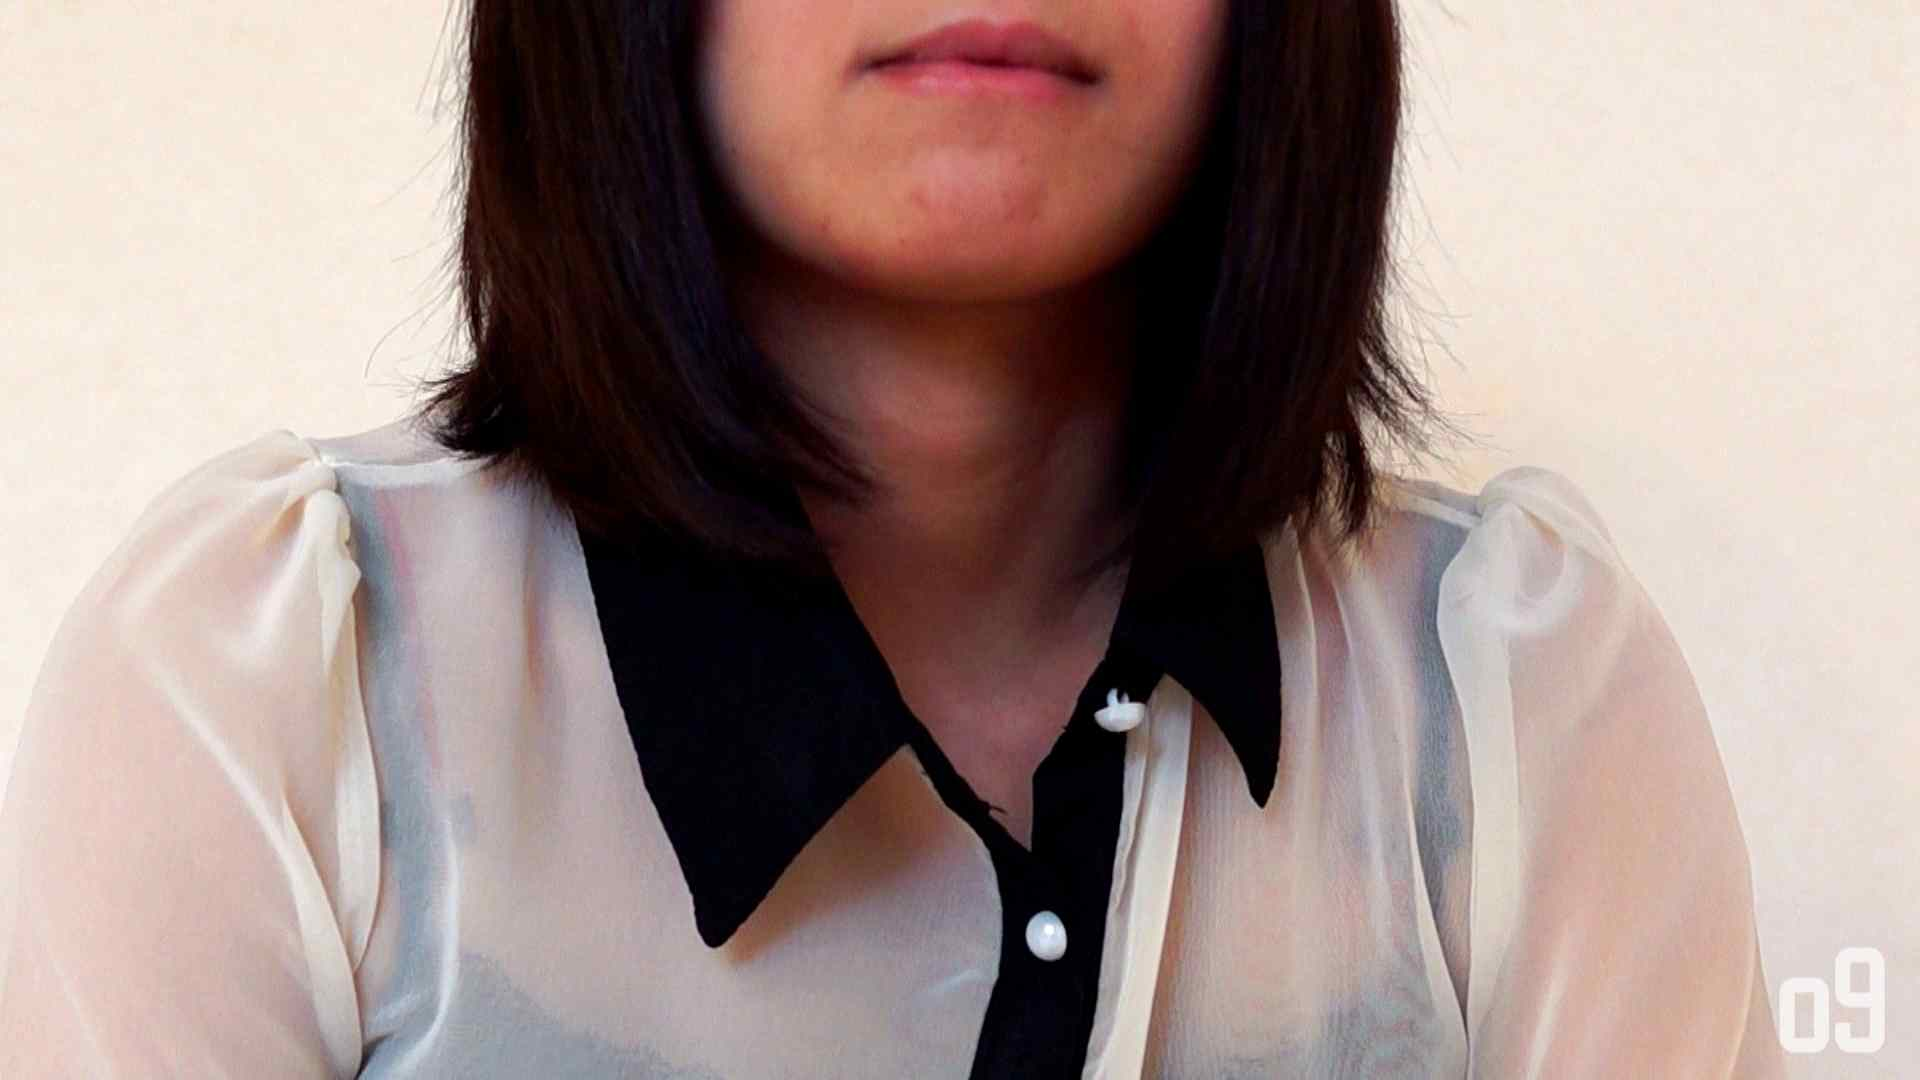 vol.1 撮影内容未確定の中、まずは私服姿撮り エッチなOL | 顔出しNG一般女性  80pic 9